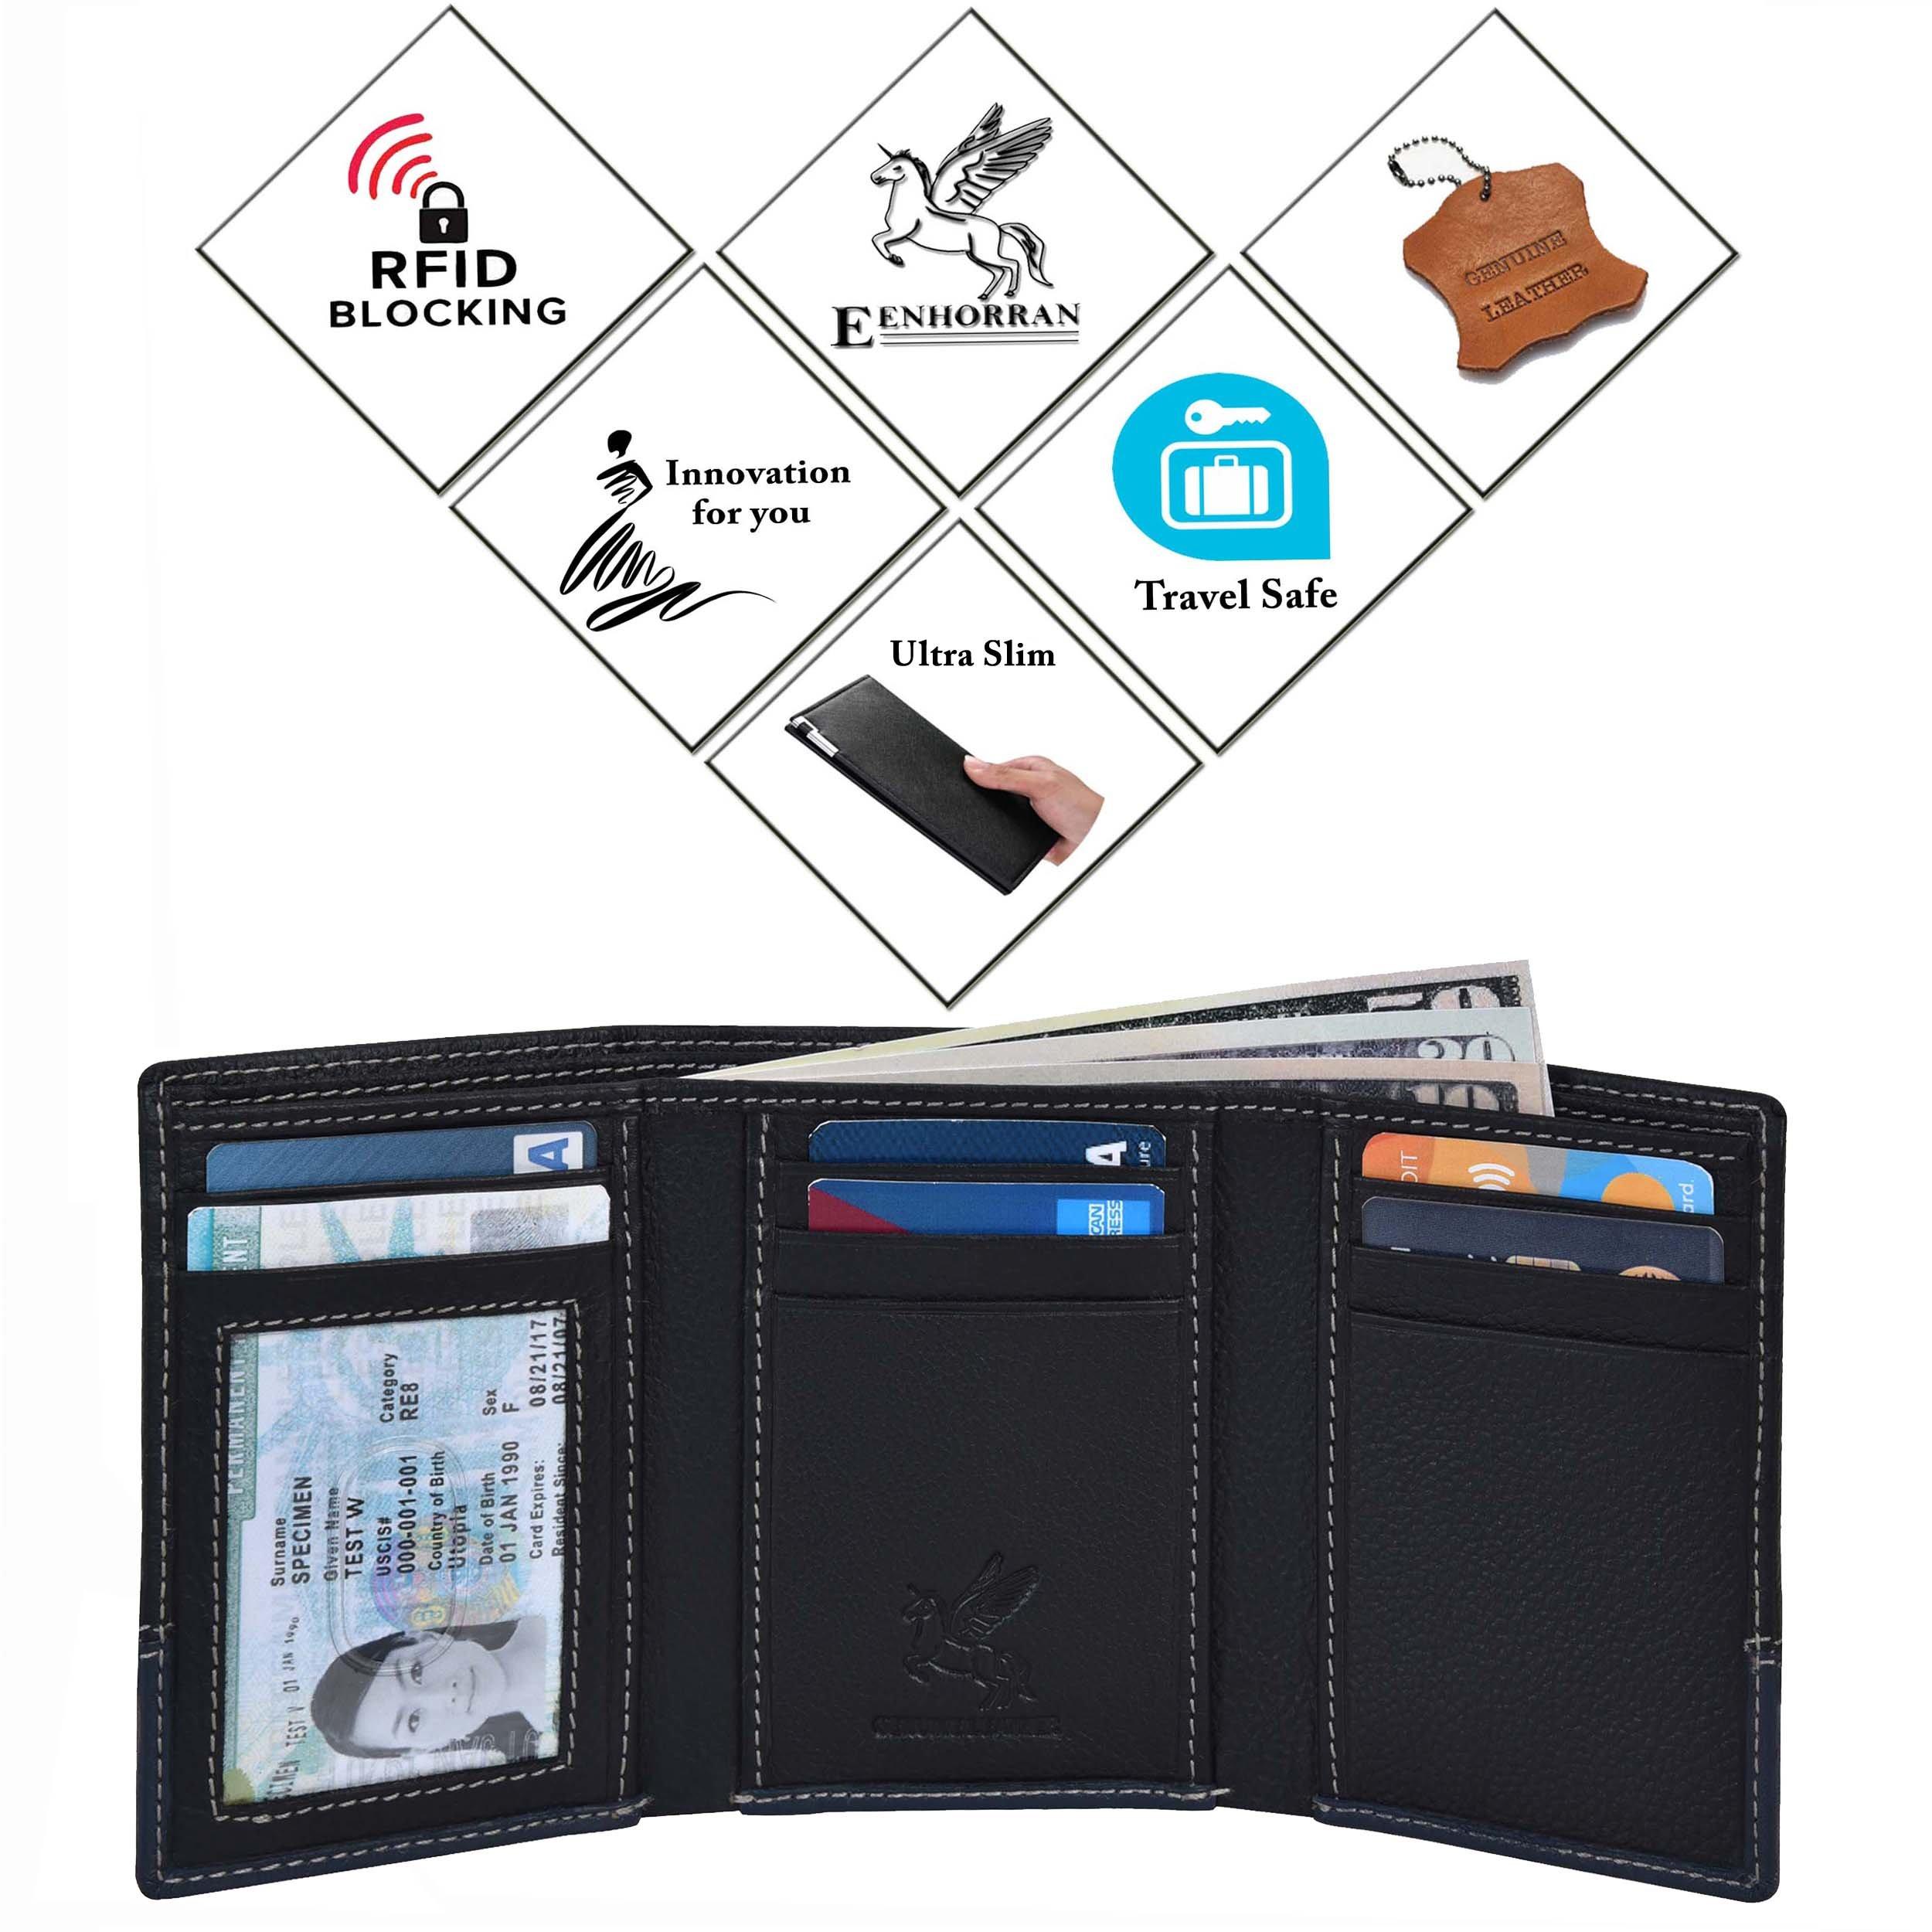 RFID Leather Trifold Wallets for Men - Handmade Slim Mens Wallet 6 Credit Card ID Window and Gift Box Secure by EENHORRAN (Black & Navy) by EENHORRAN (Image #7)